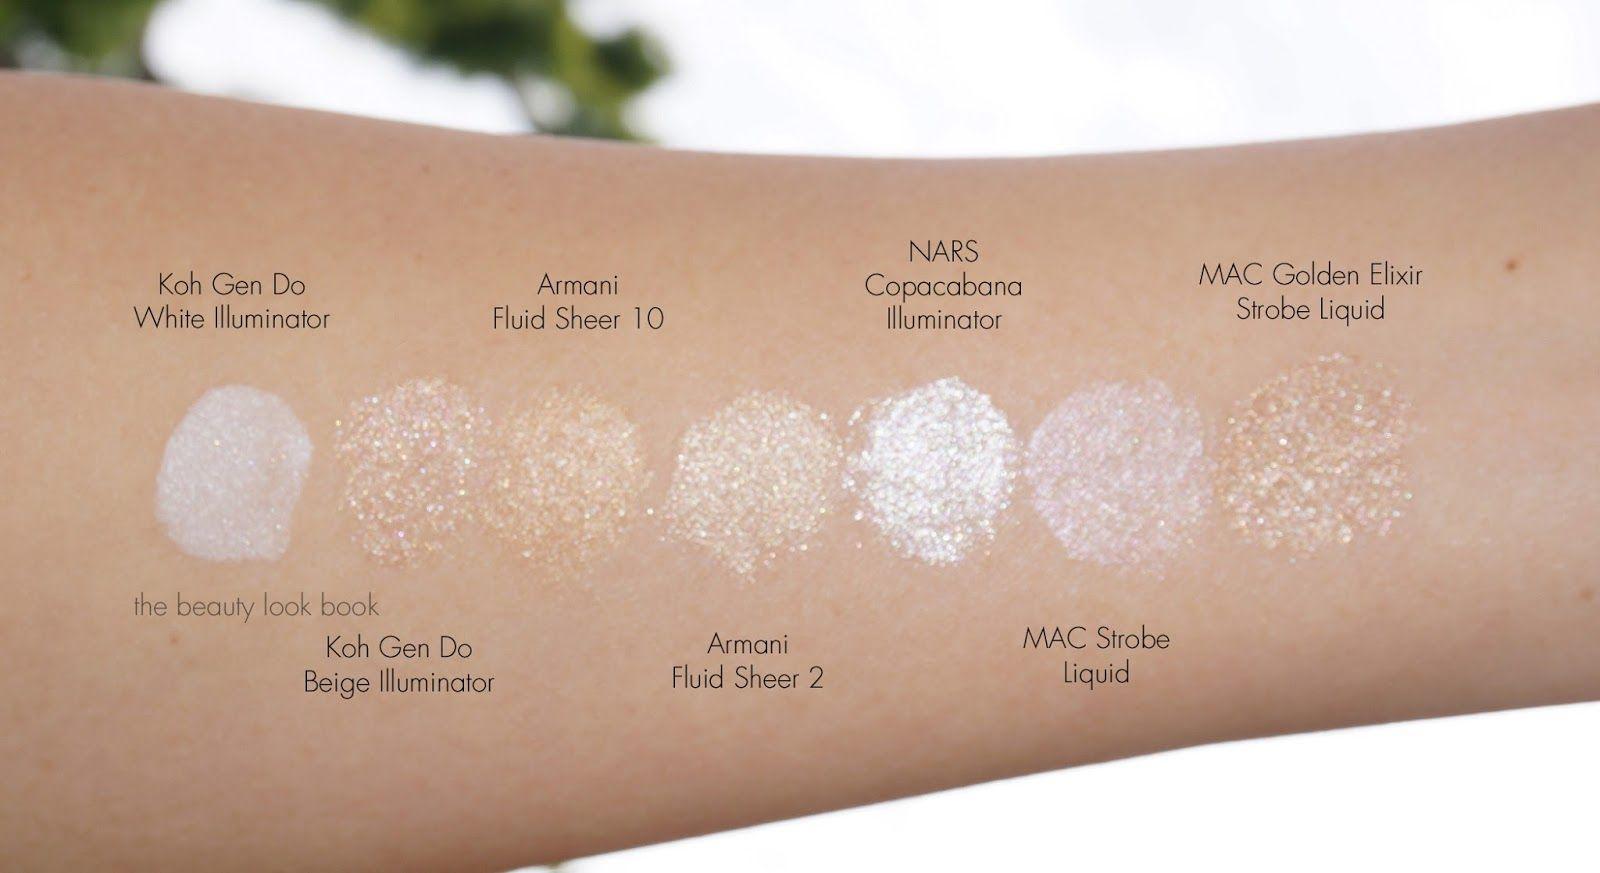 Koh Gen Do Aqua Foundation Illuminator In Beige Il01 Koh Gen Do Beauty Makeup Tips Illuminator